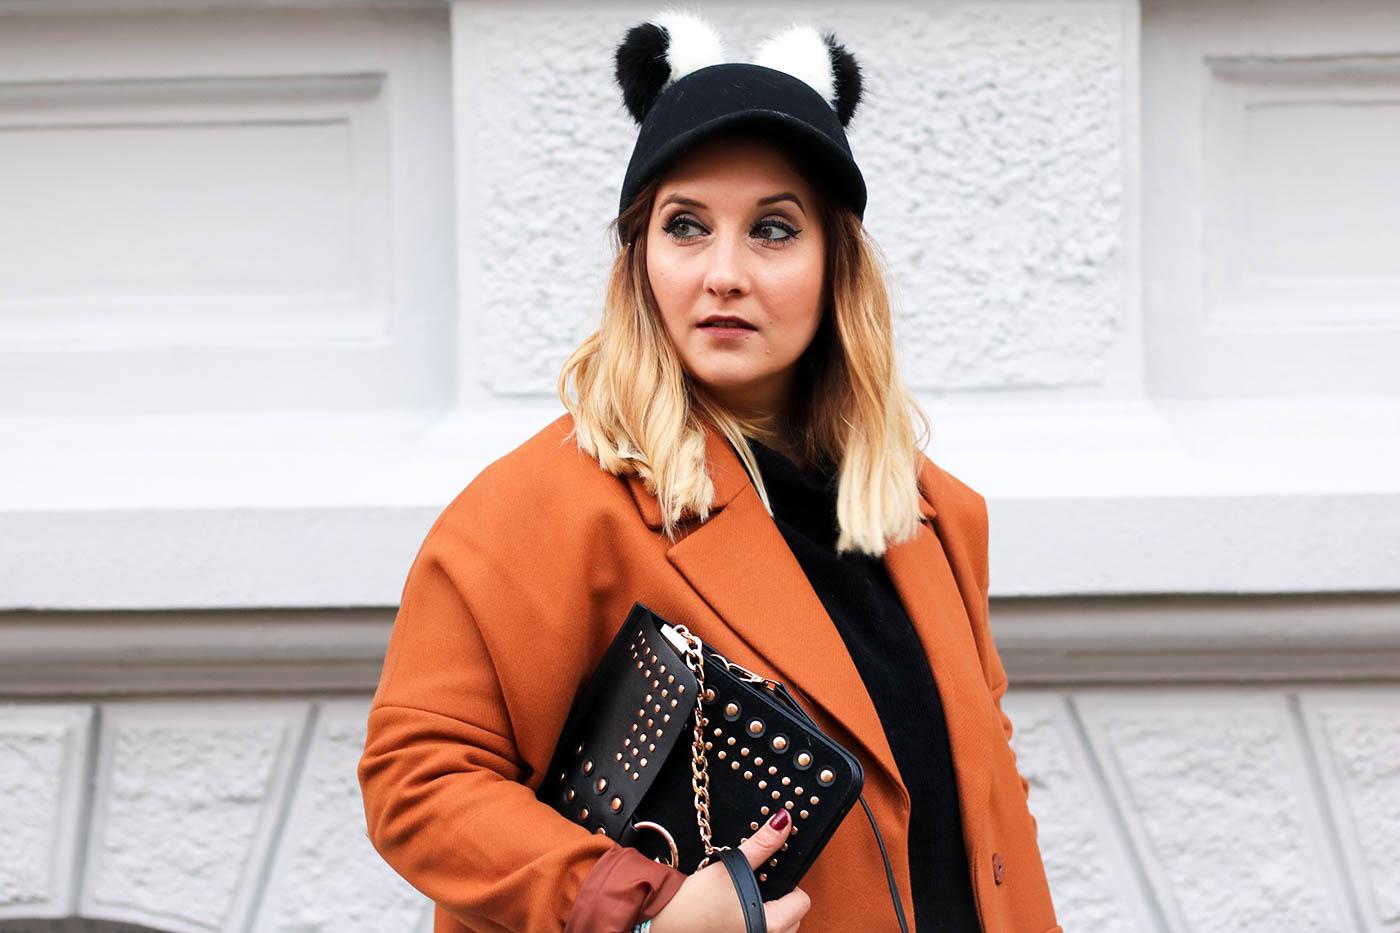 outfit-look-style-mantel-cappe-fashionblog-modeblog-gewinnspiel10